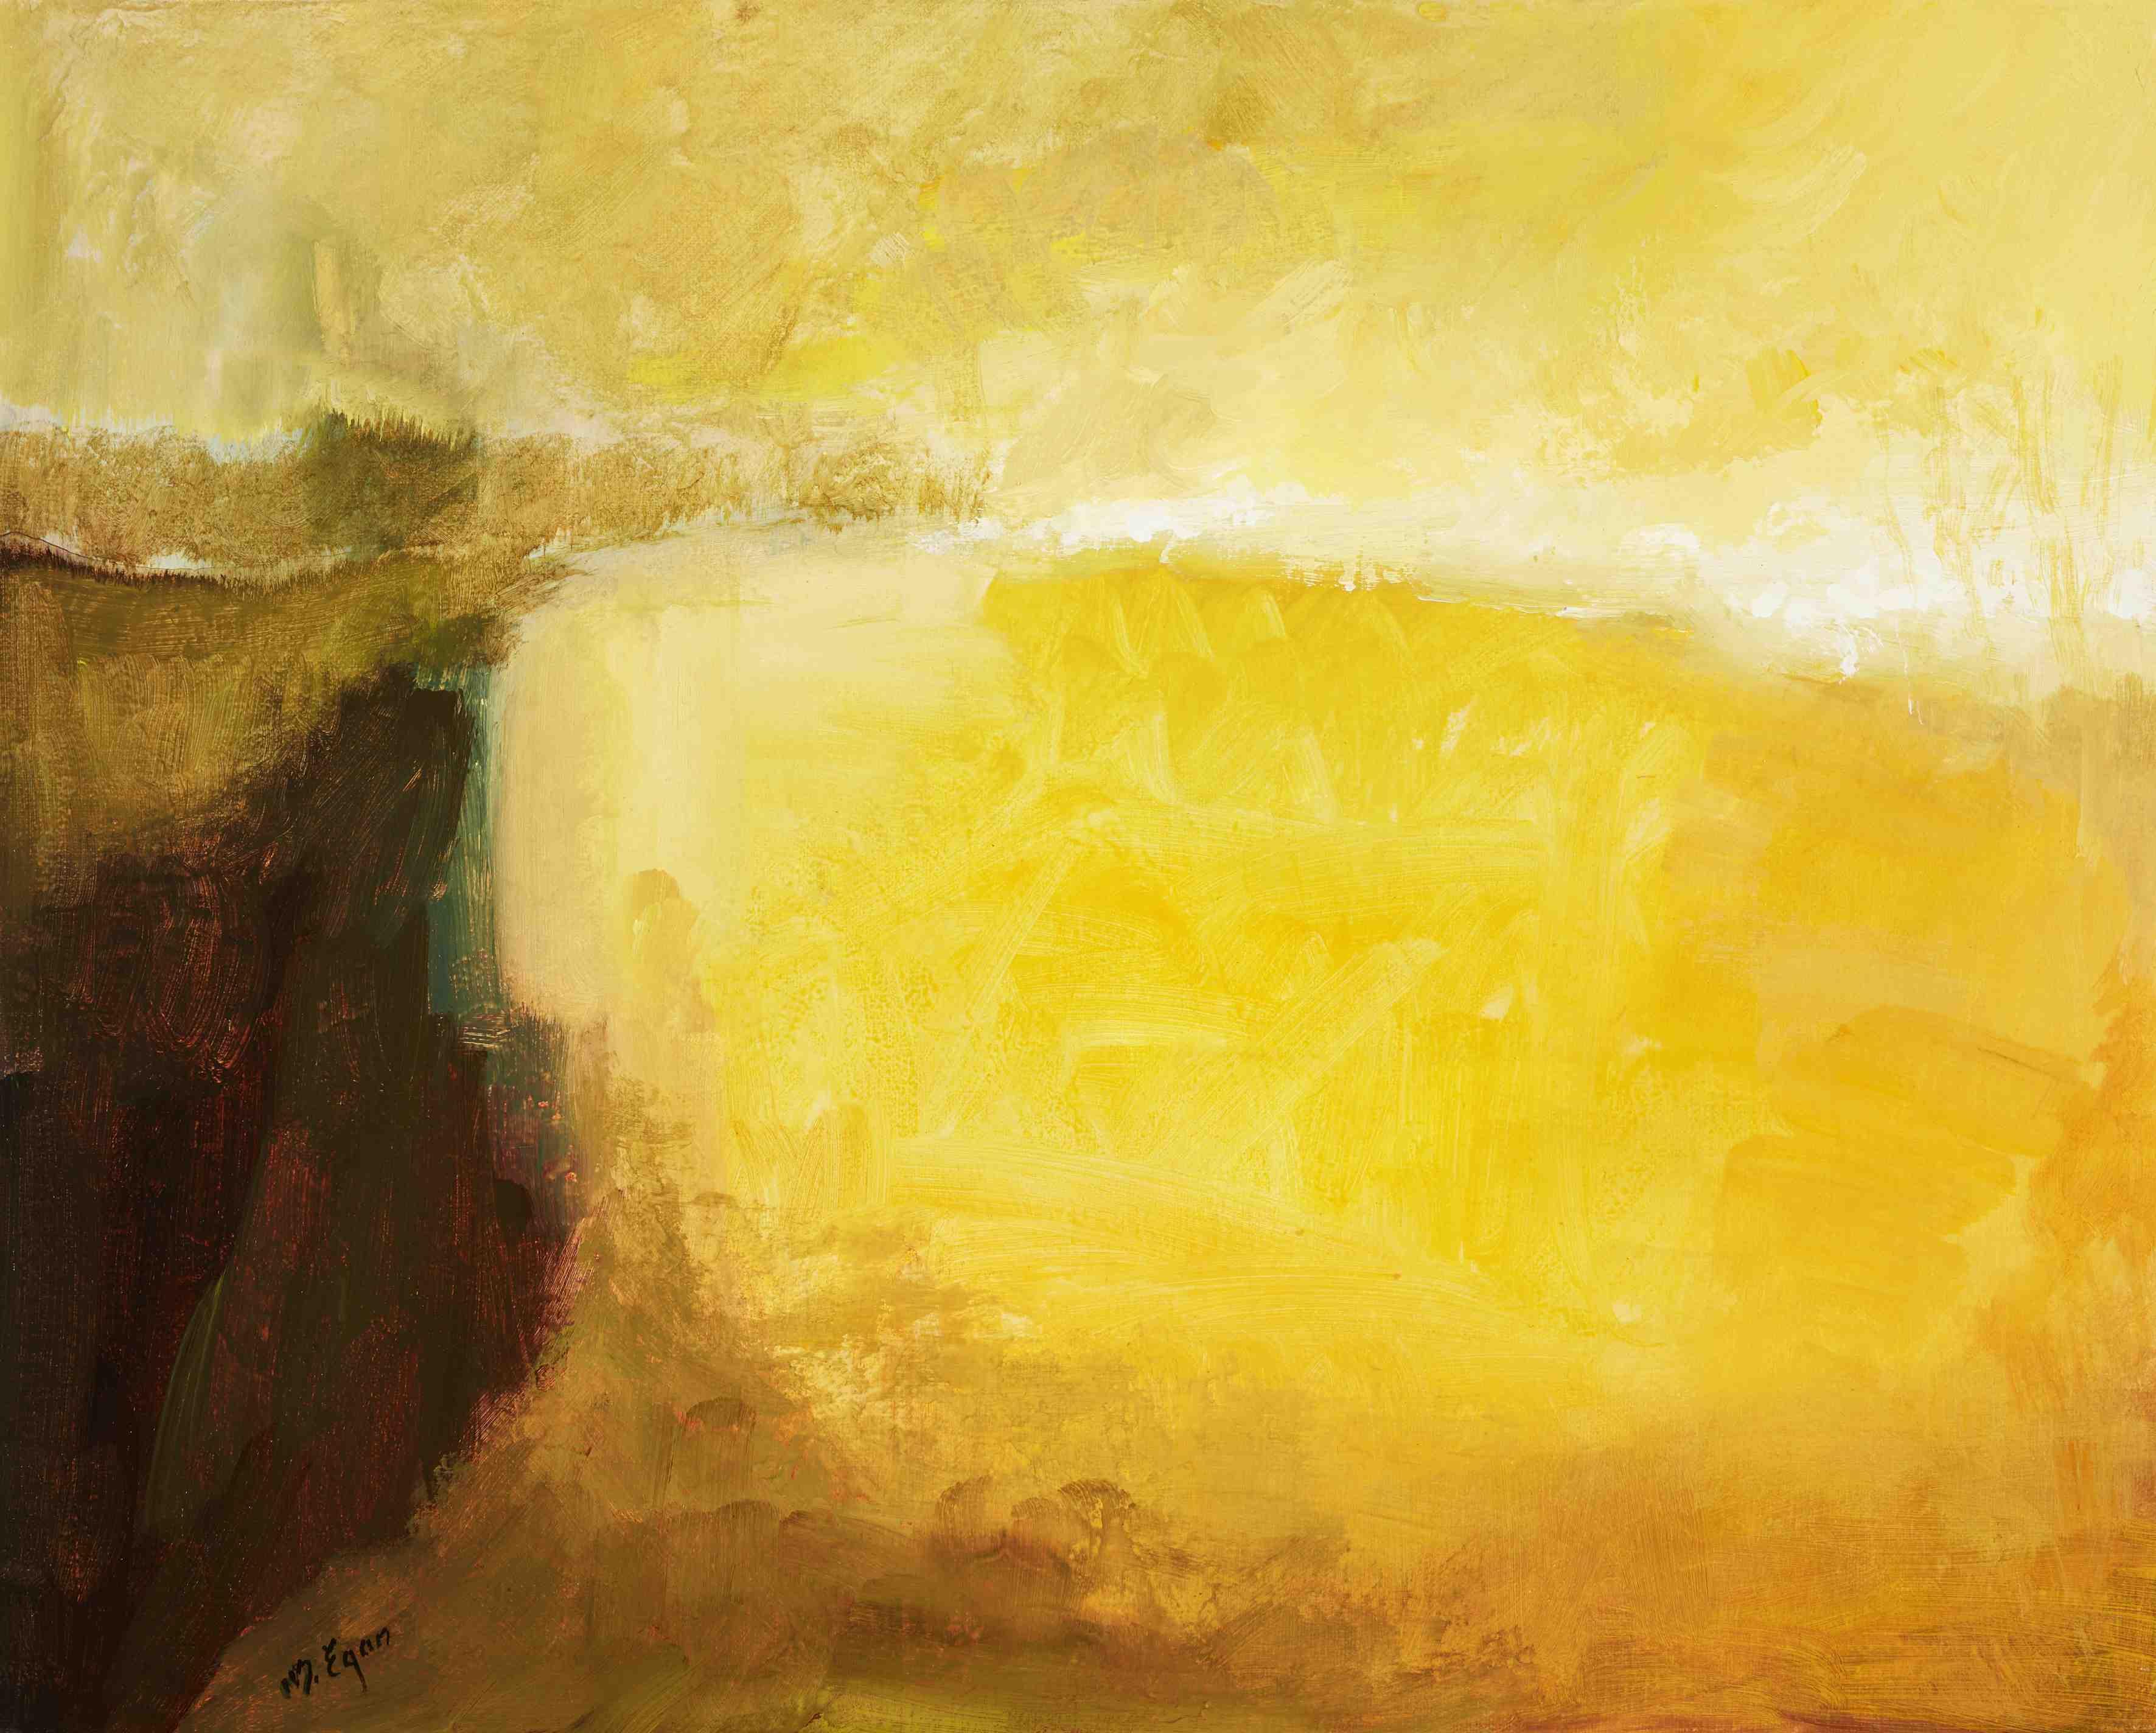 Margaret Egan, Seapoint I, 39 x 49 cm, acrylic on linen